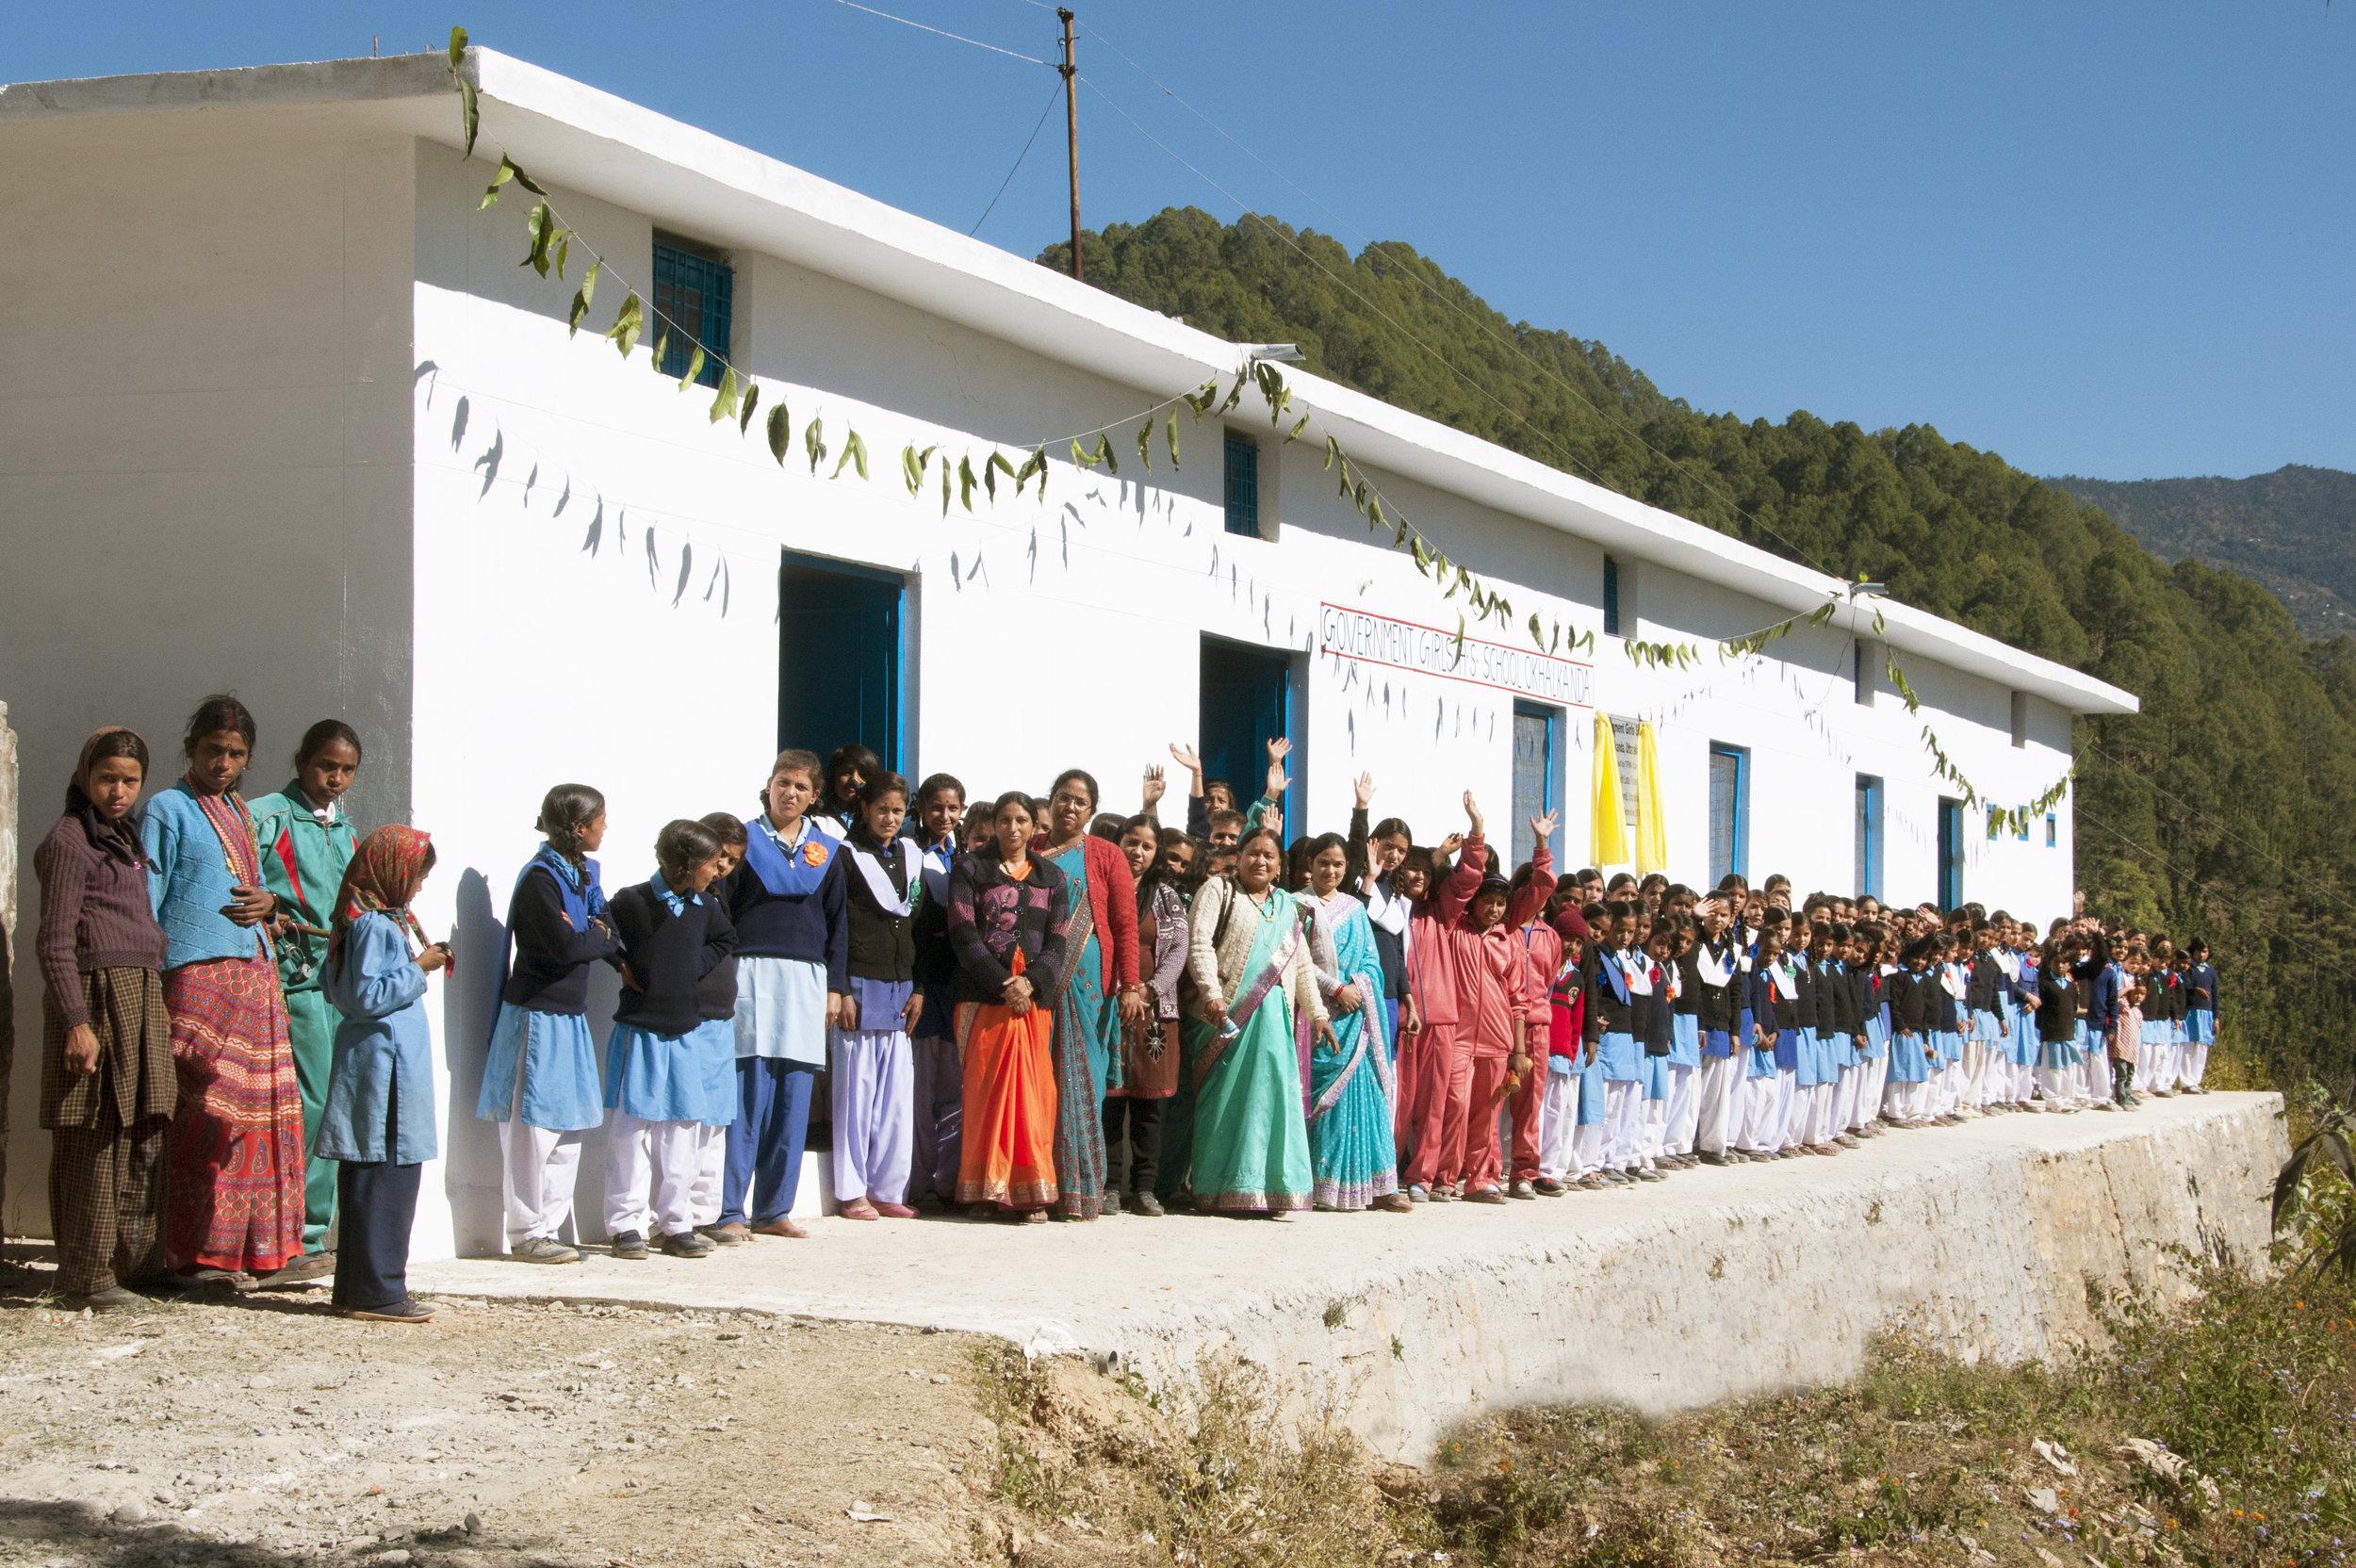 Okhalkanda Girls' Home, Uttrakhand - Funded by TFWA Care